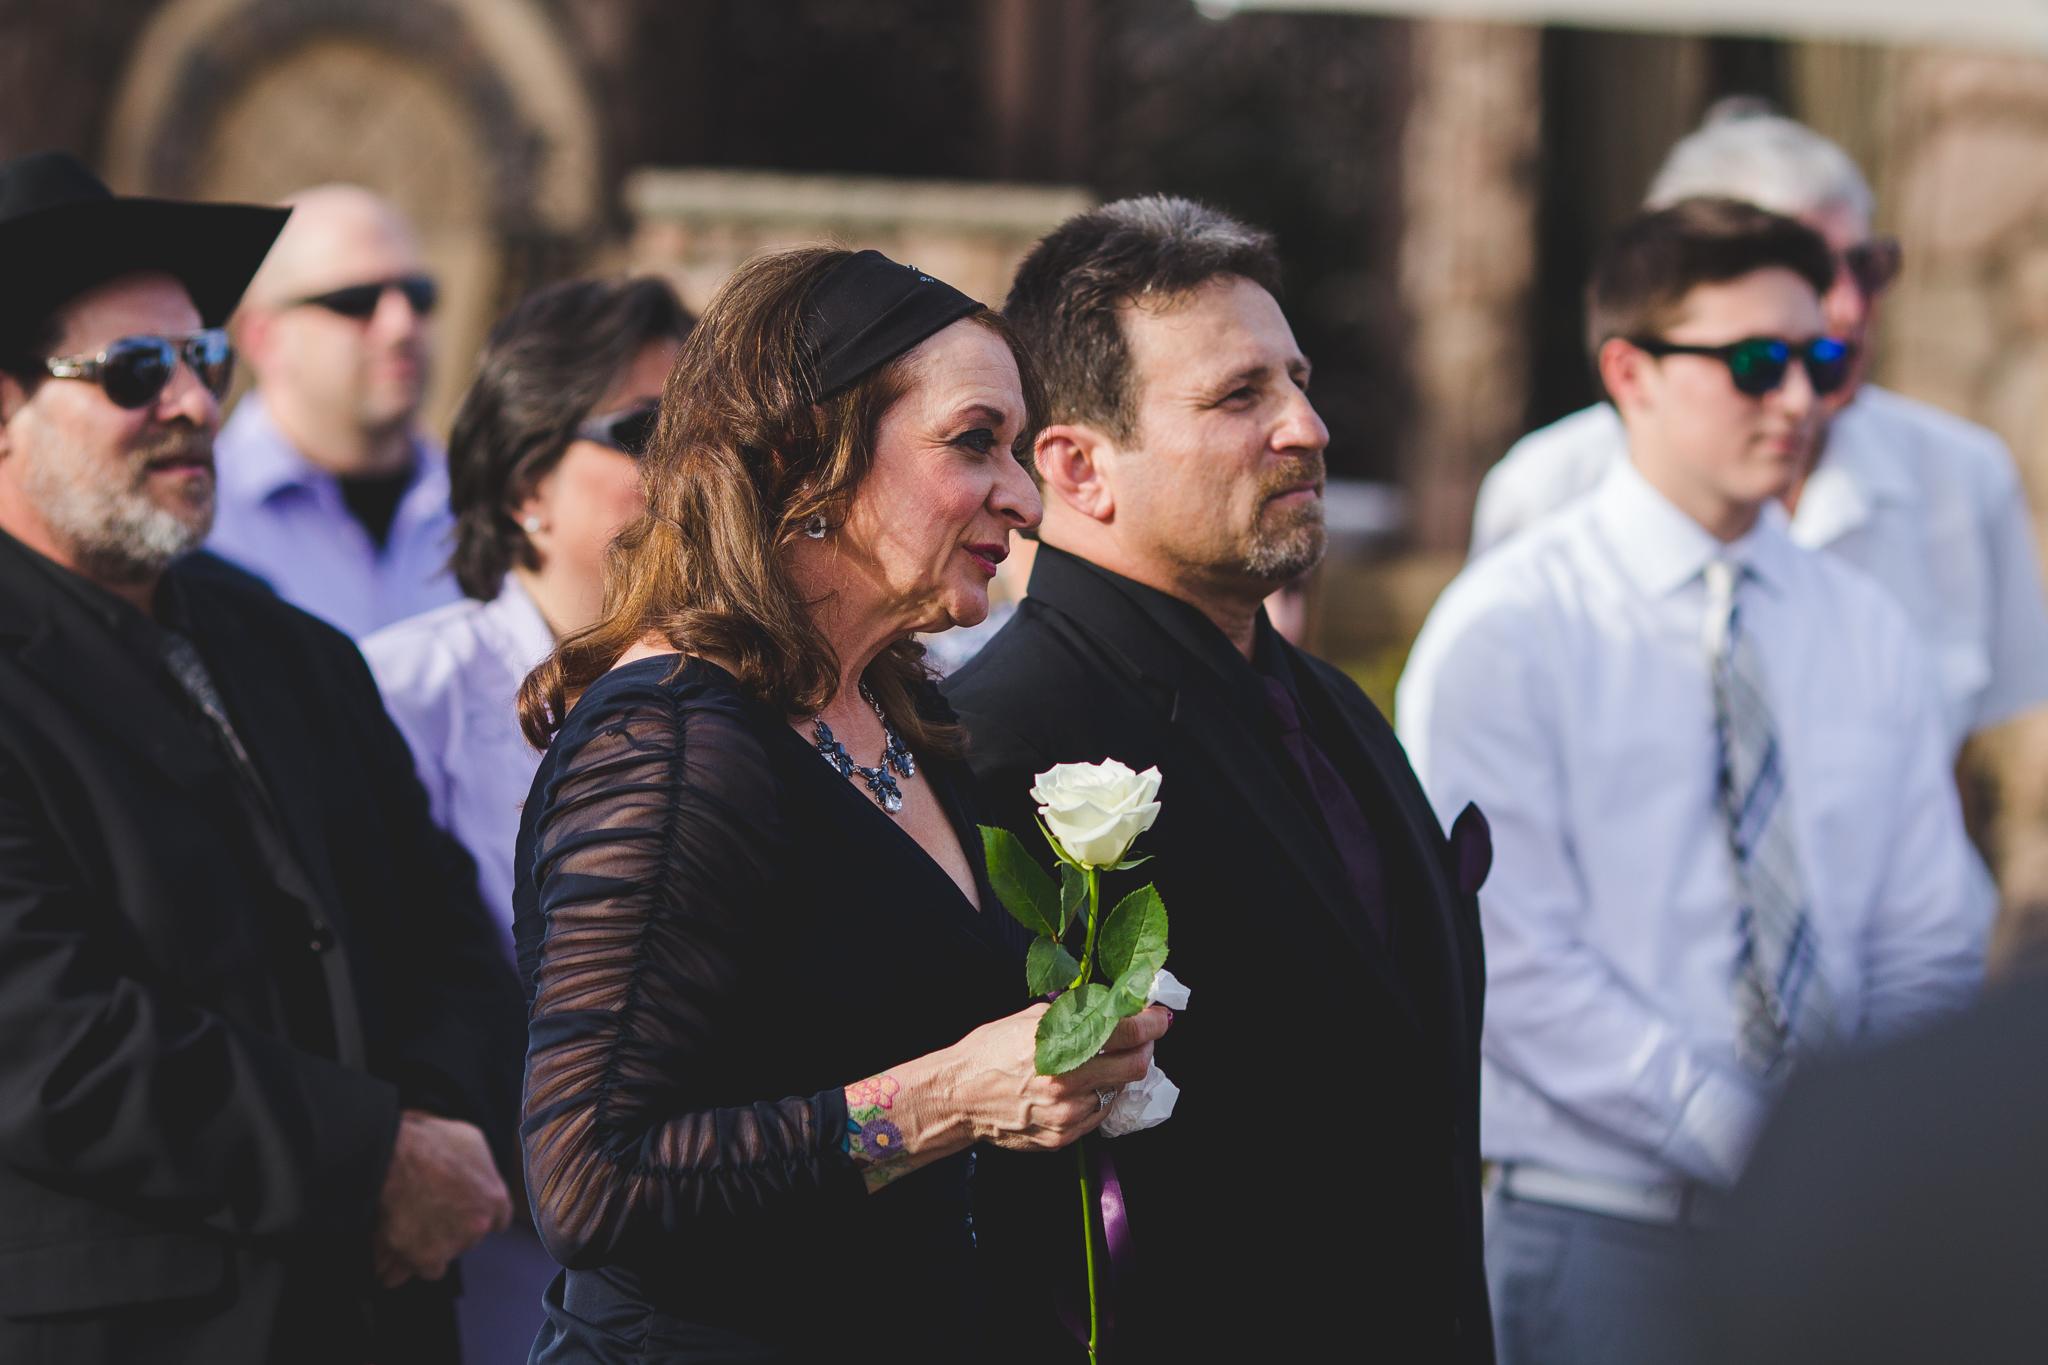 parents of bride look on ceremony